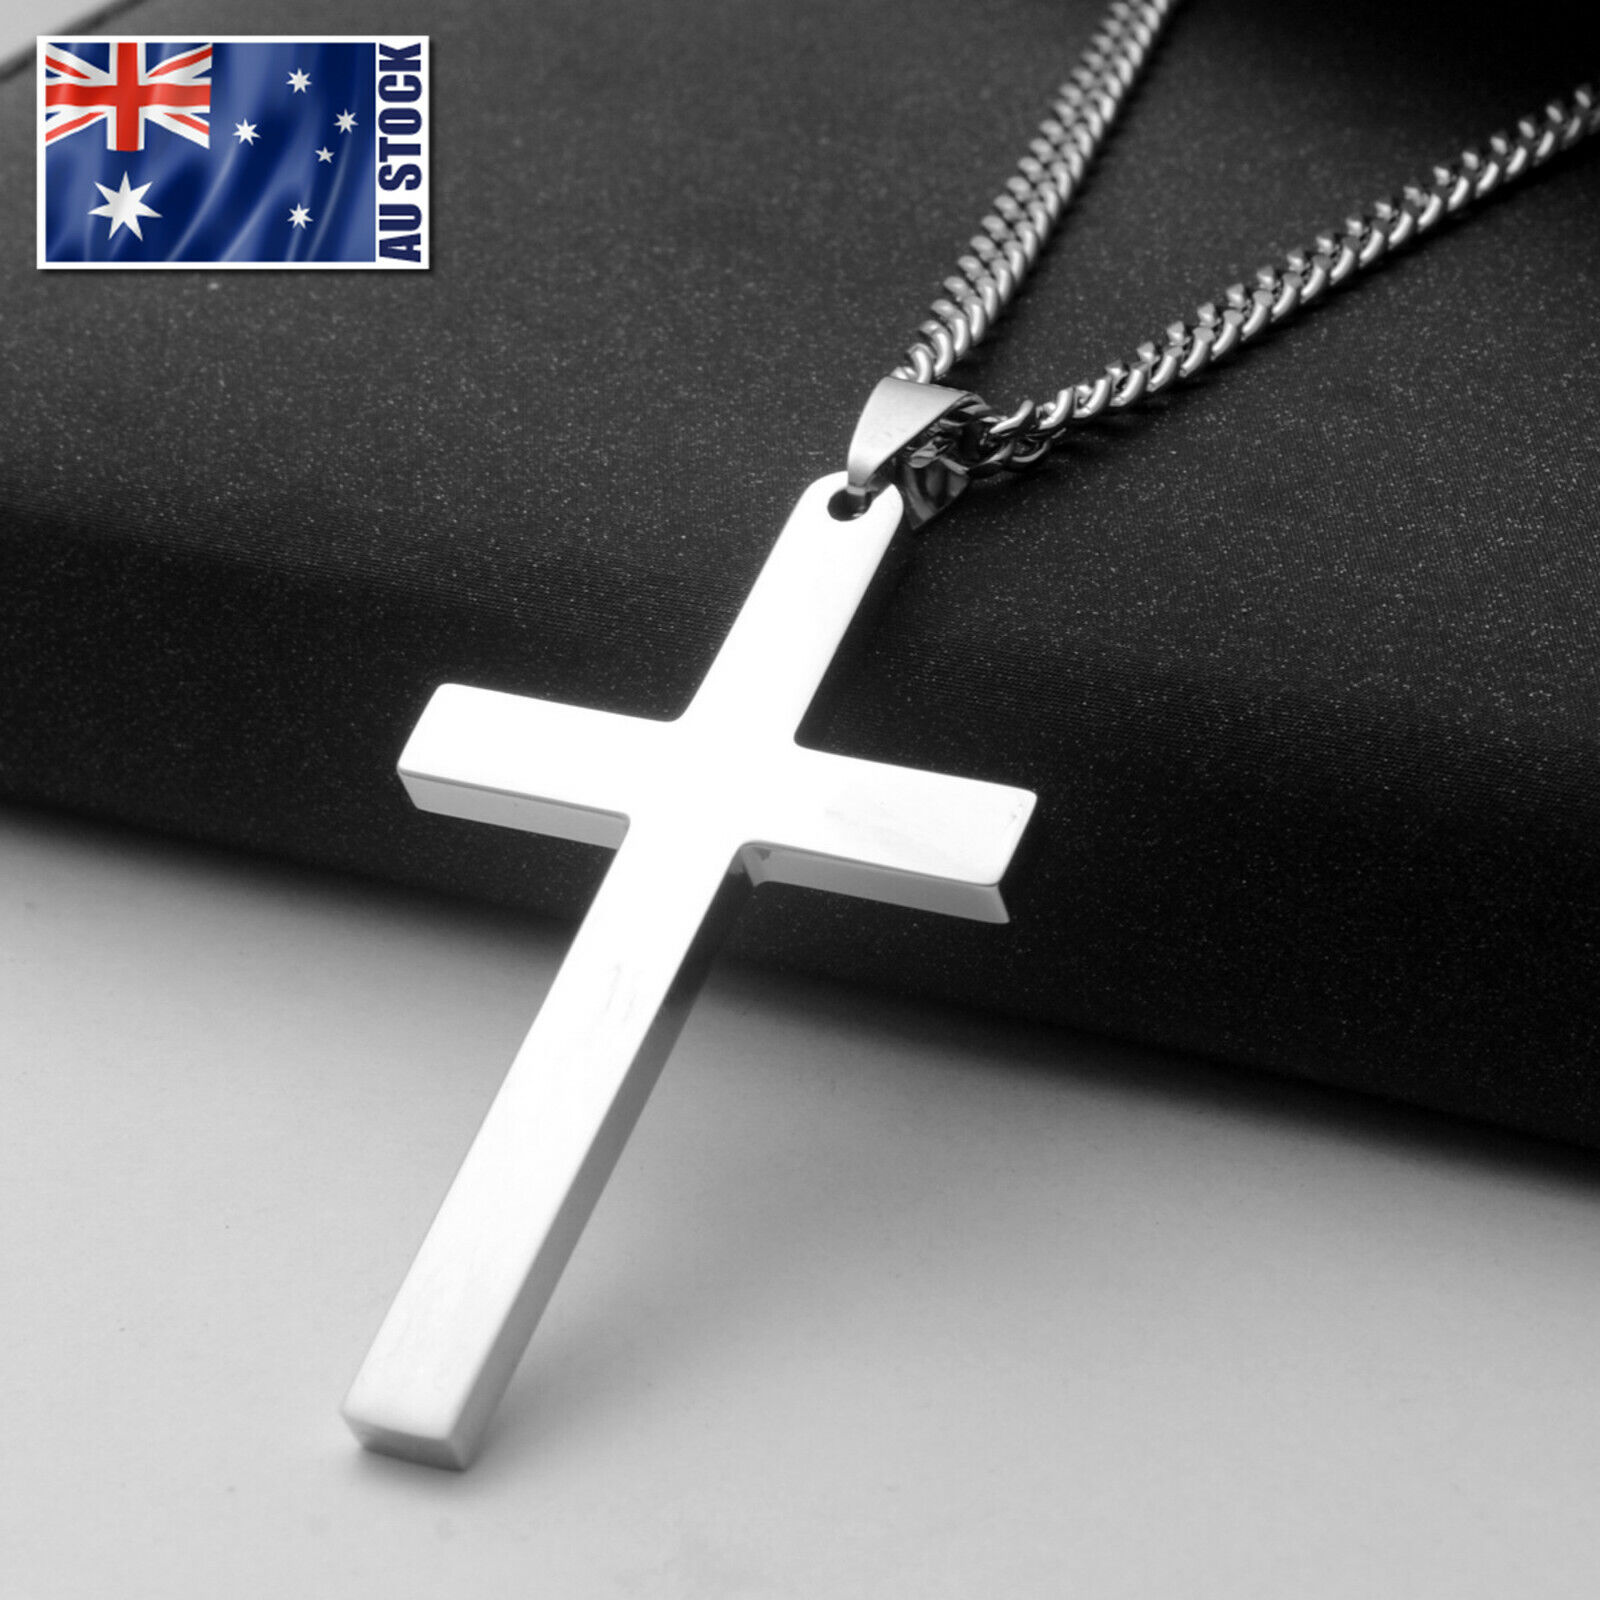 Jewellery - Stainless Steel Plain Silver Jesus Cross Crucifix Pendant Necklace Mens & Womens